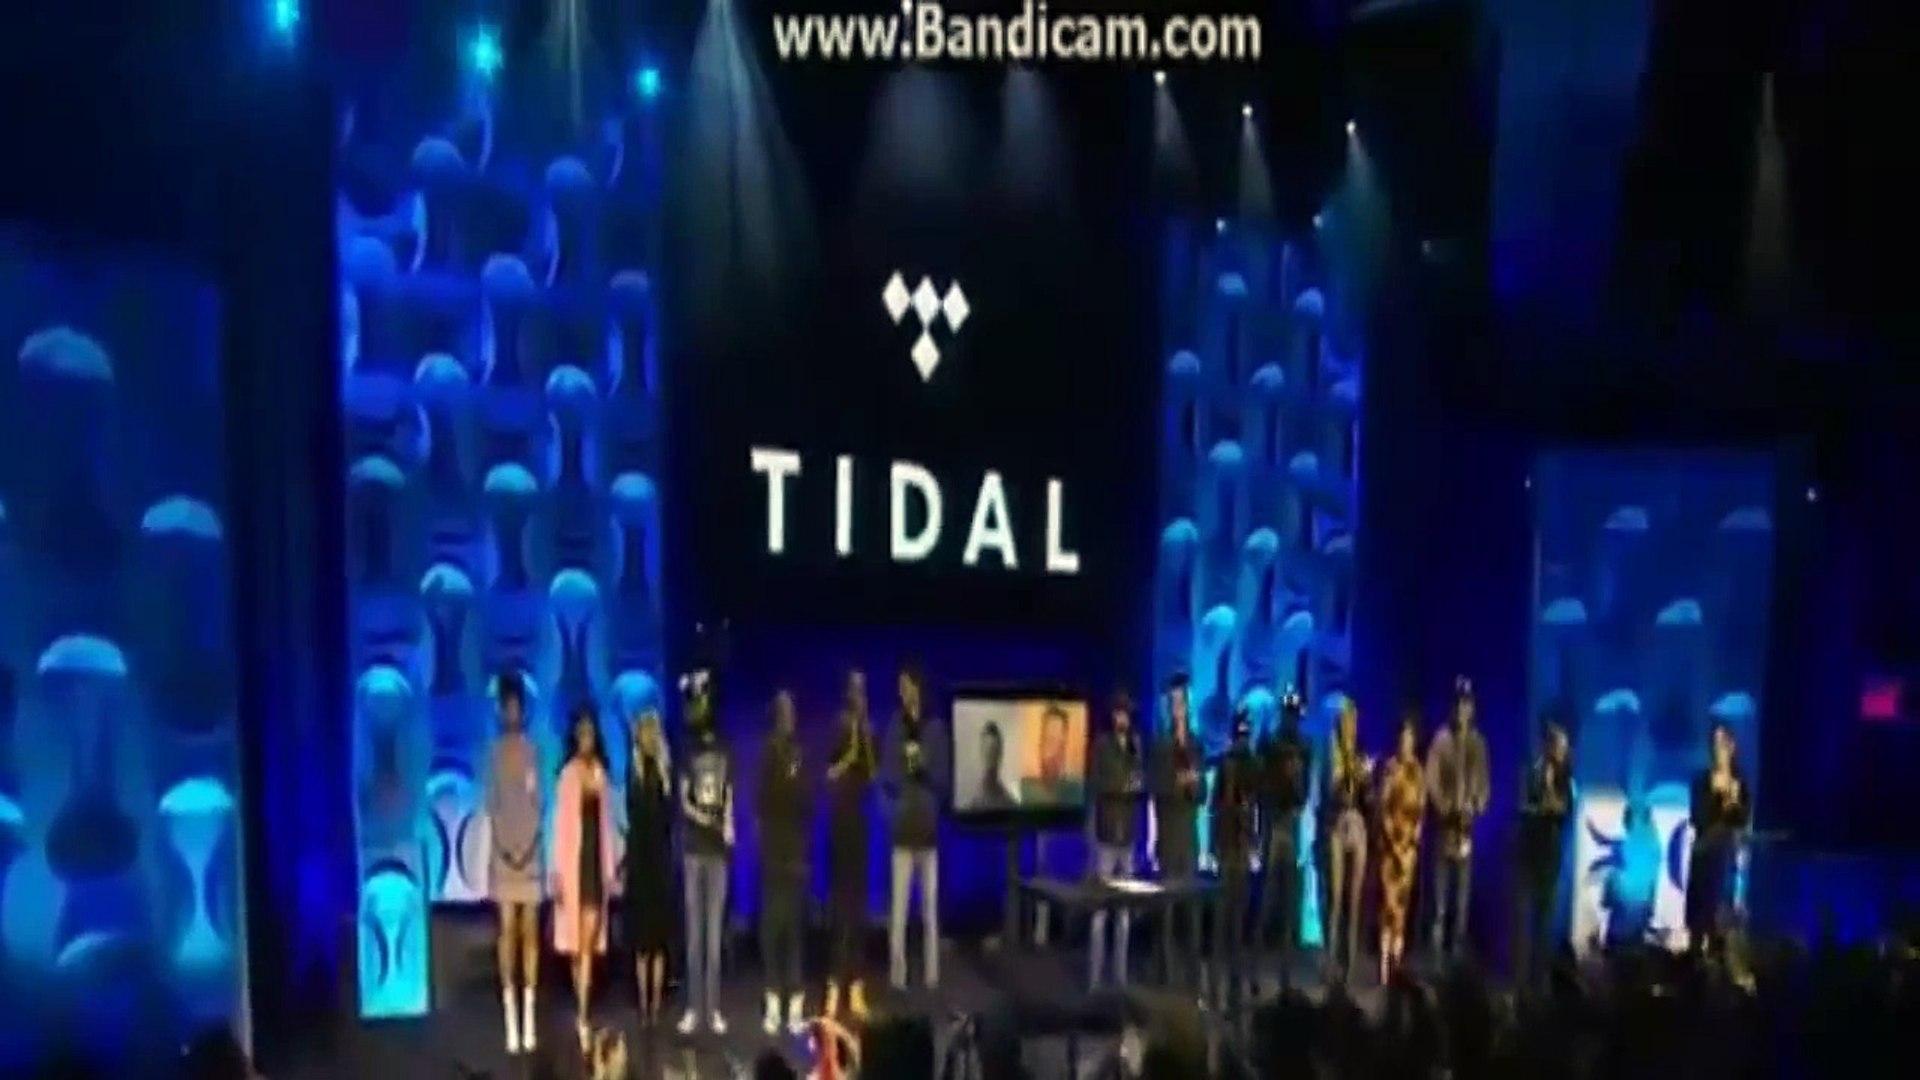 Tidal Press Conference !!! Jay z , Rhianna ,Beyonce , Daft Punk Tidal Press Conference 2015 #tidal